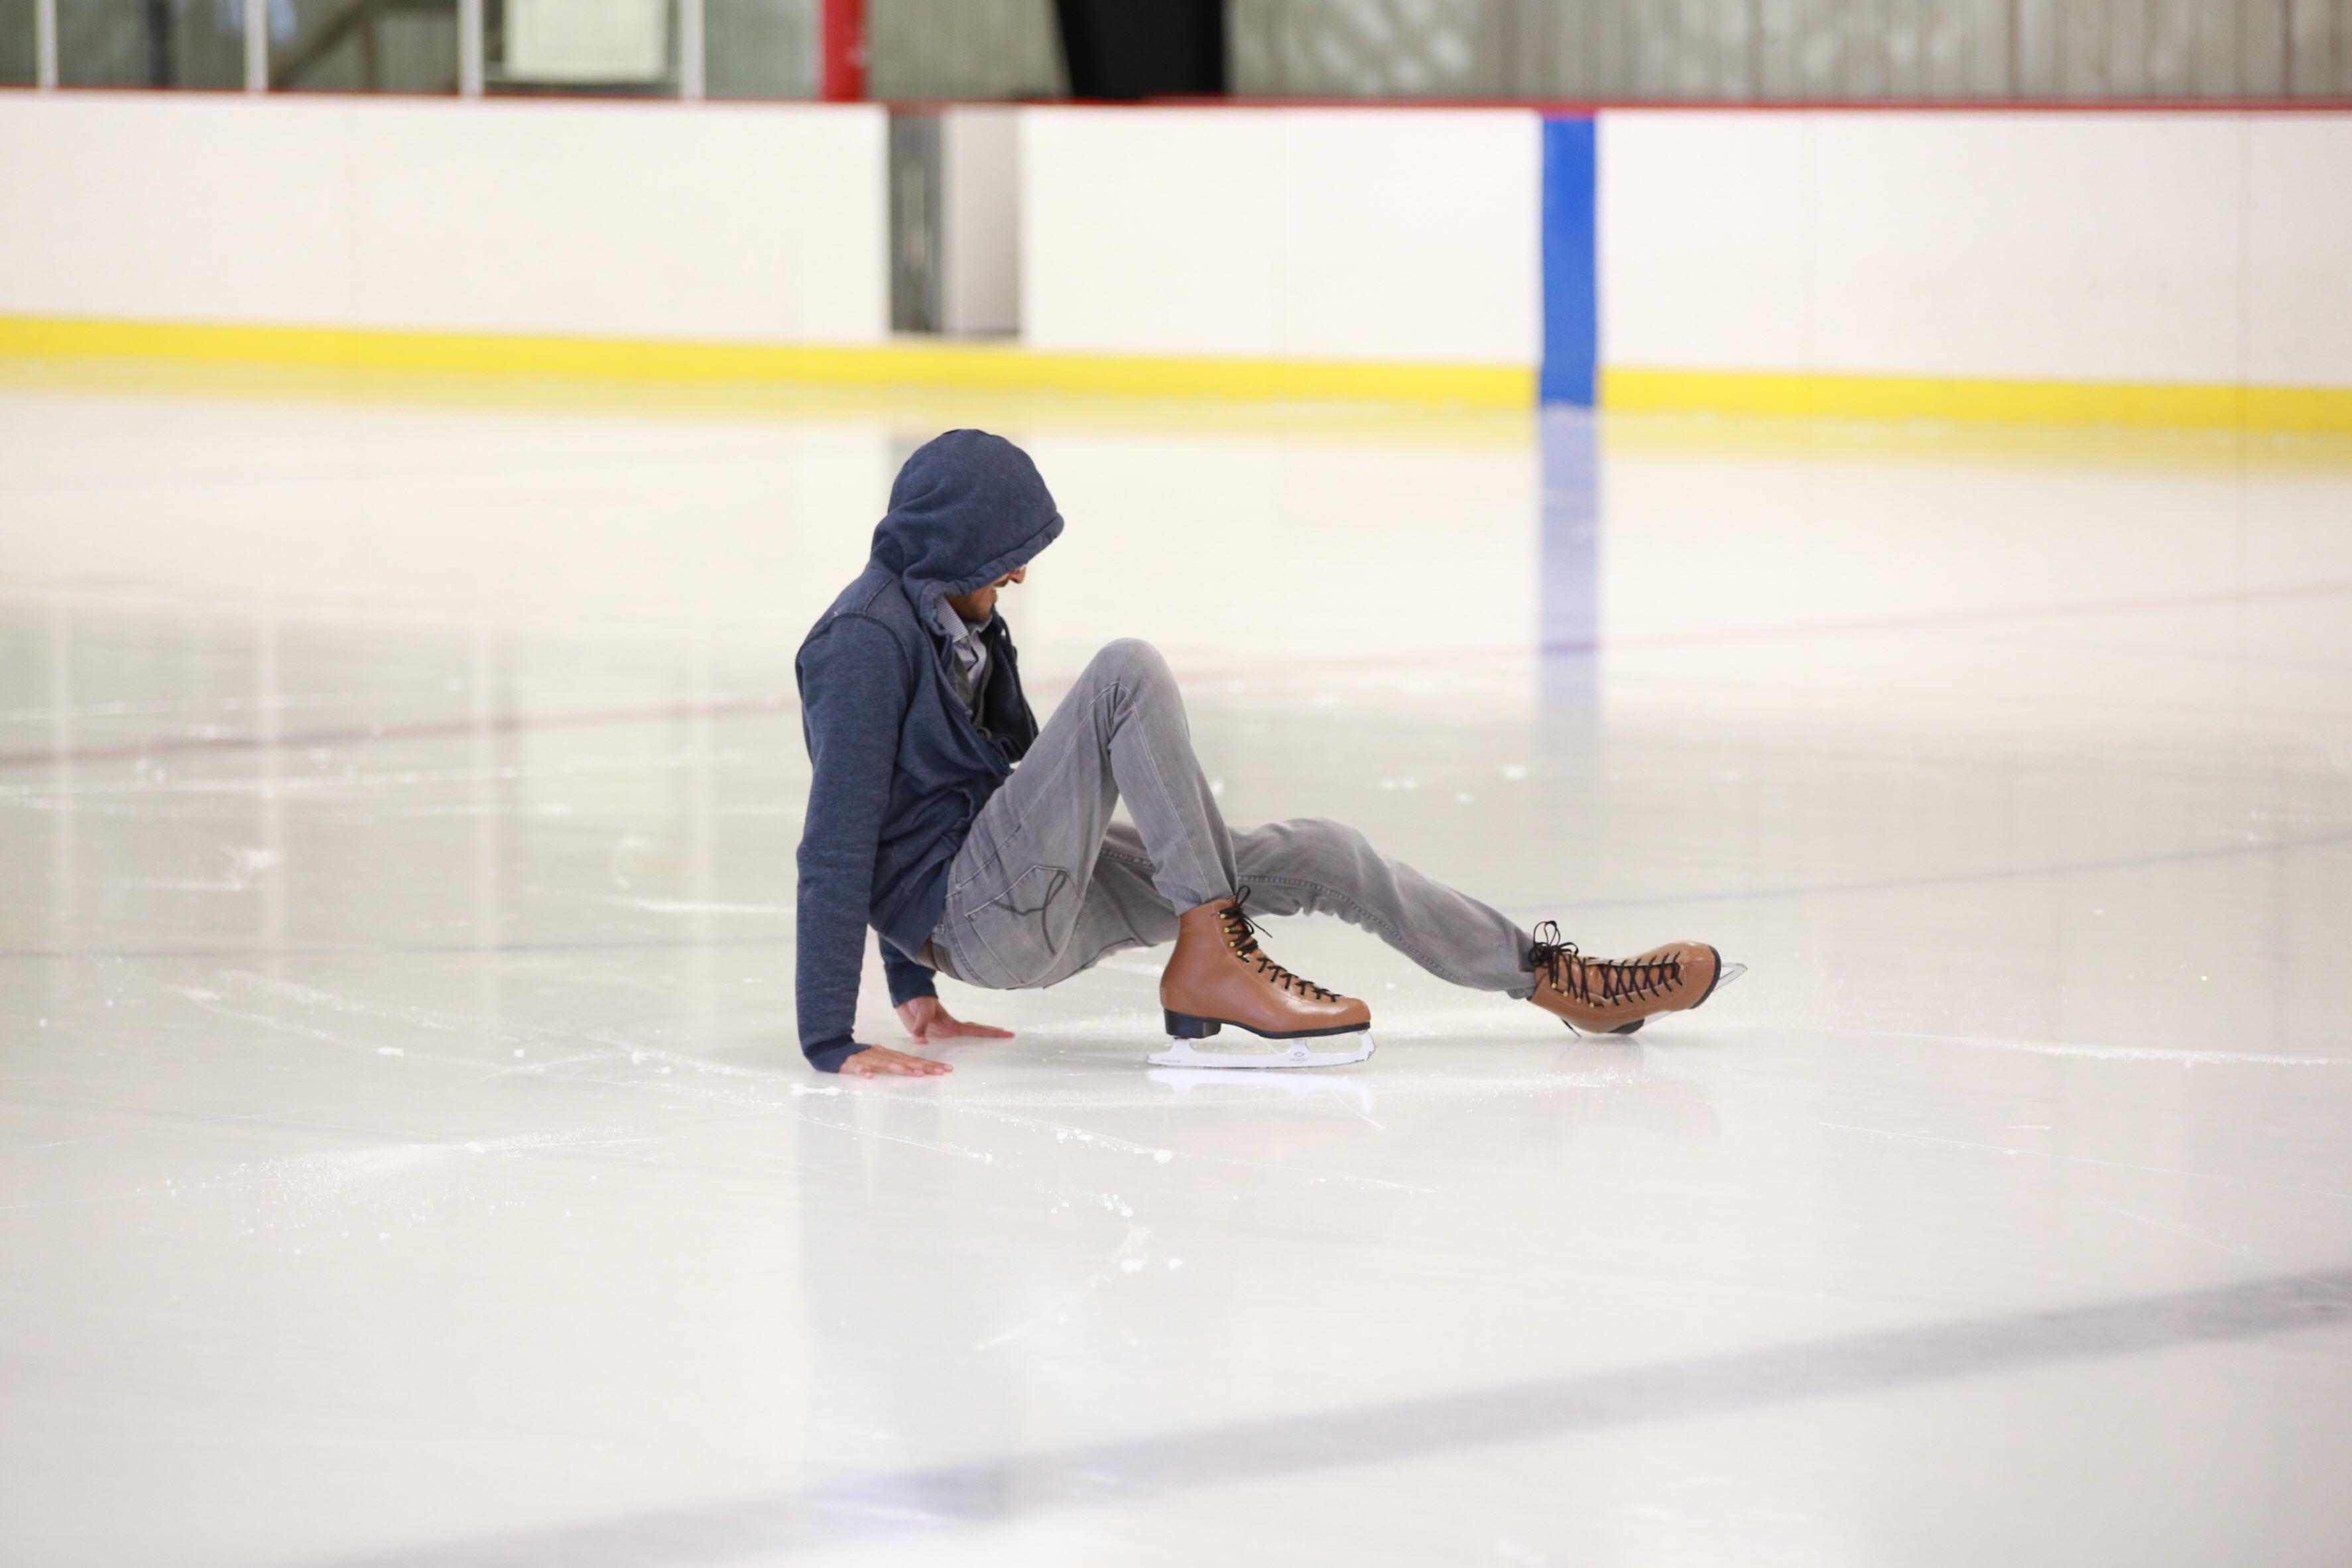 Employees enjoying ice skating day